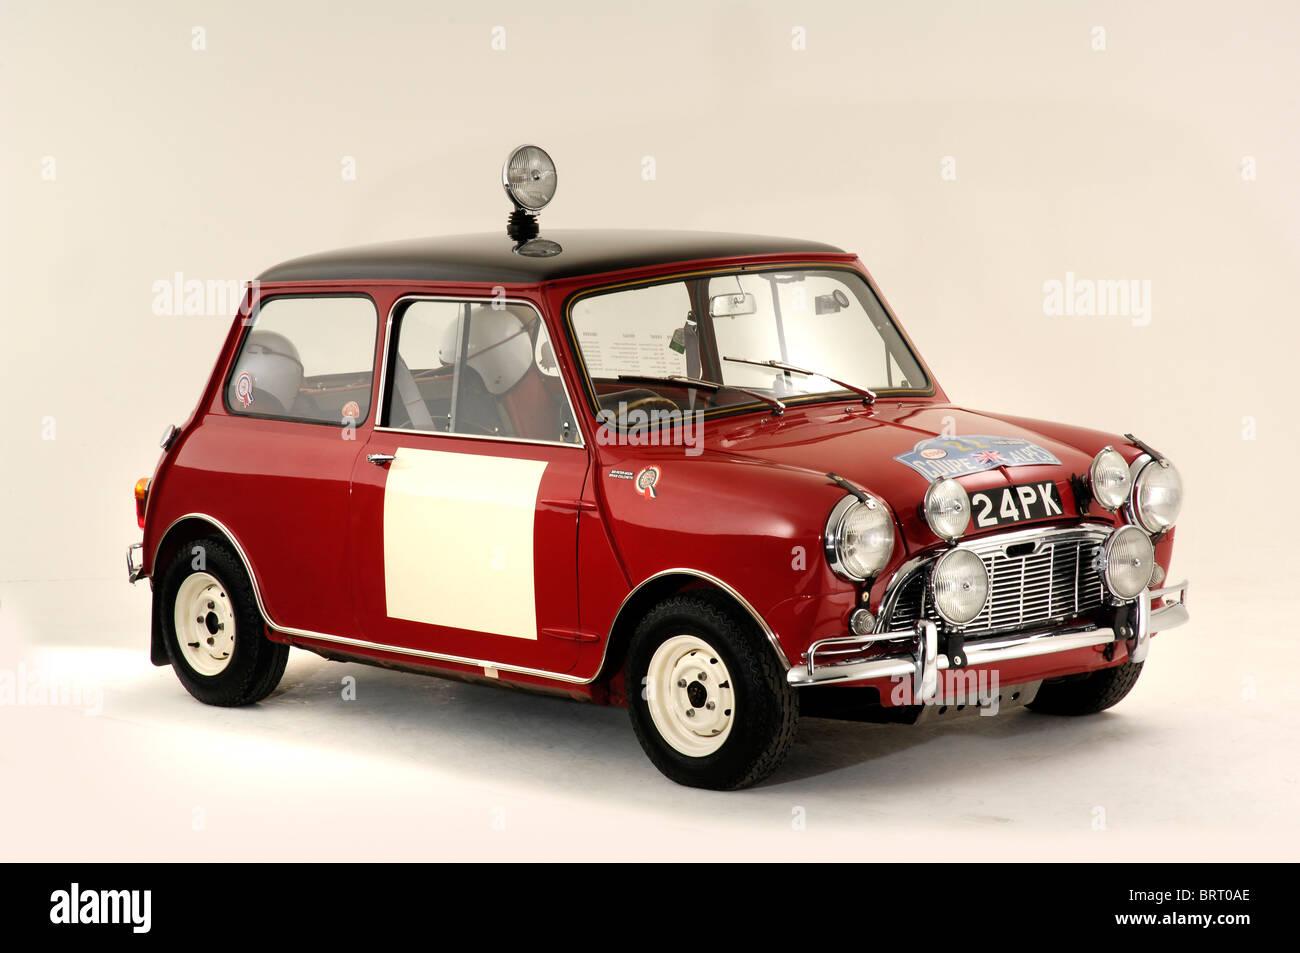 Austin Mini Cooper S 1963 - Stock Image